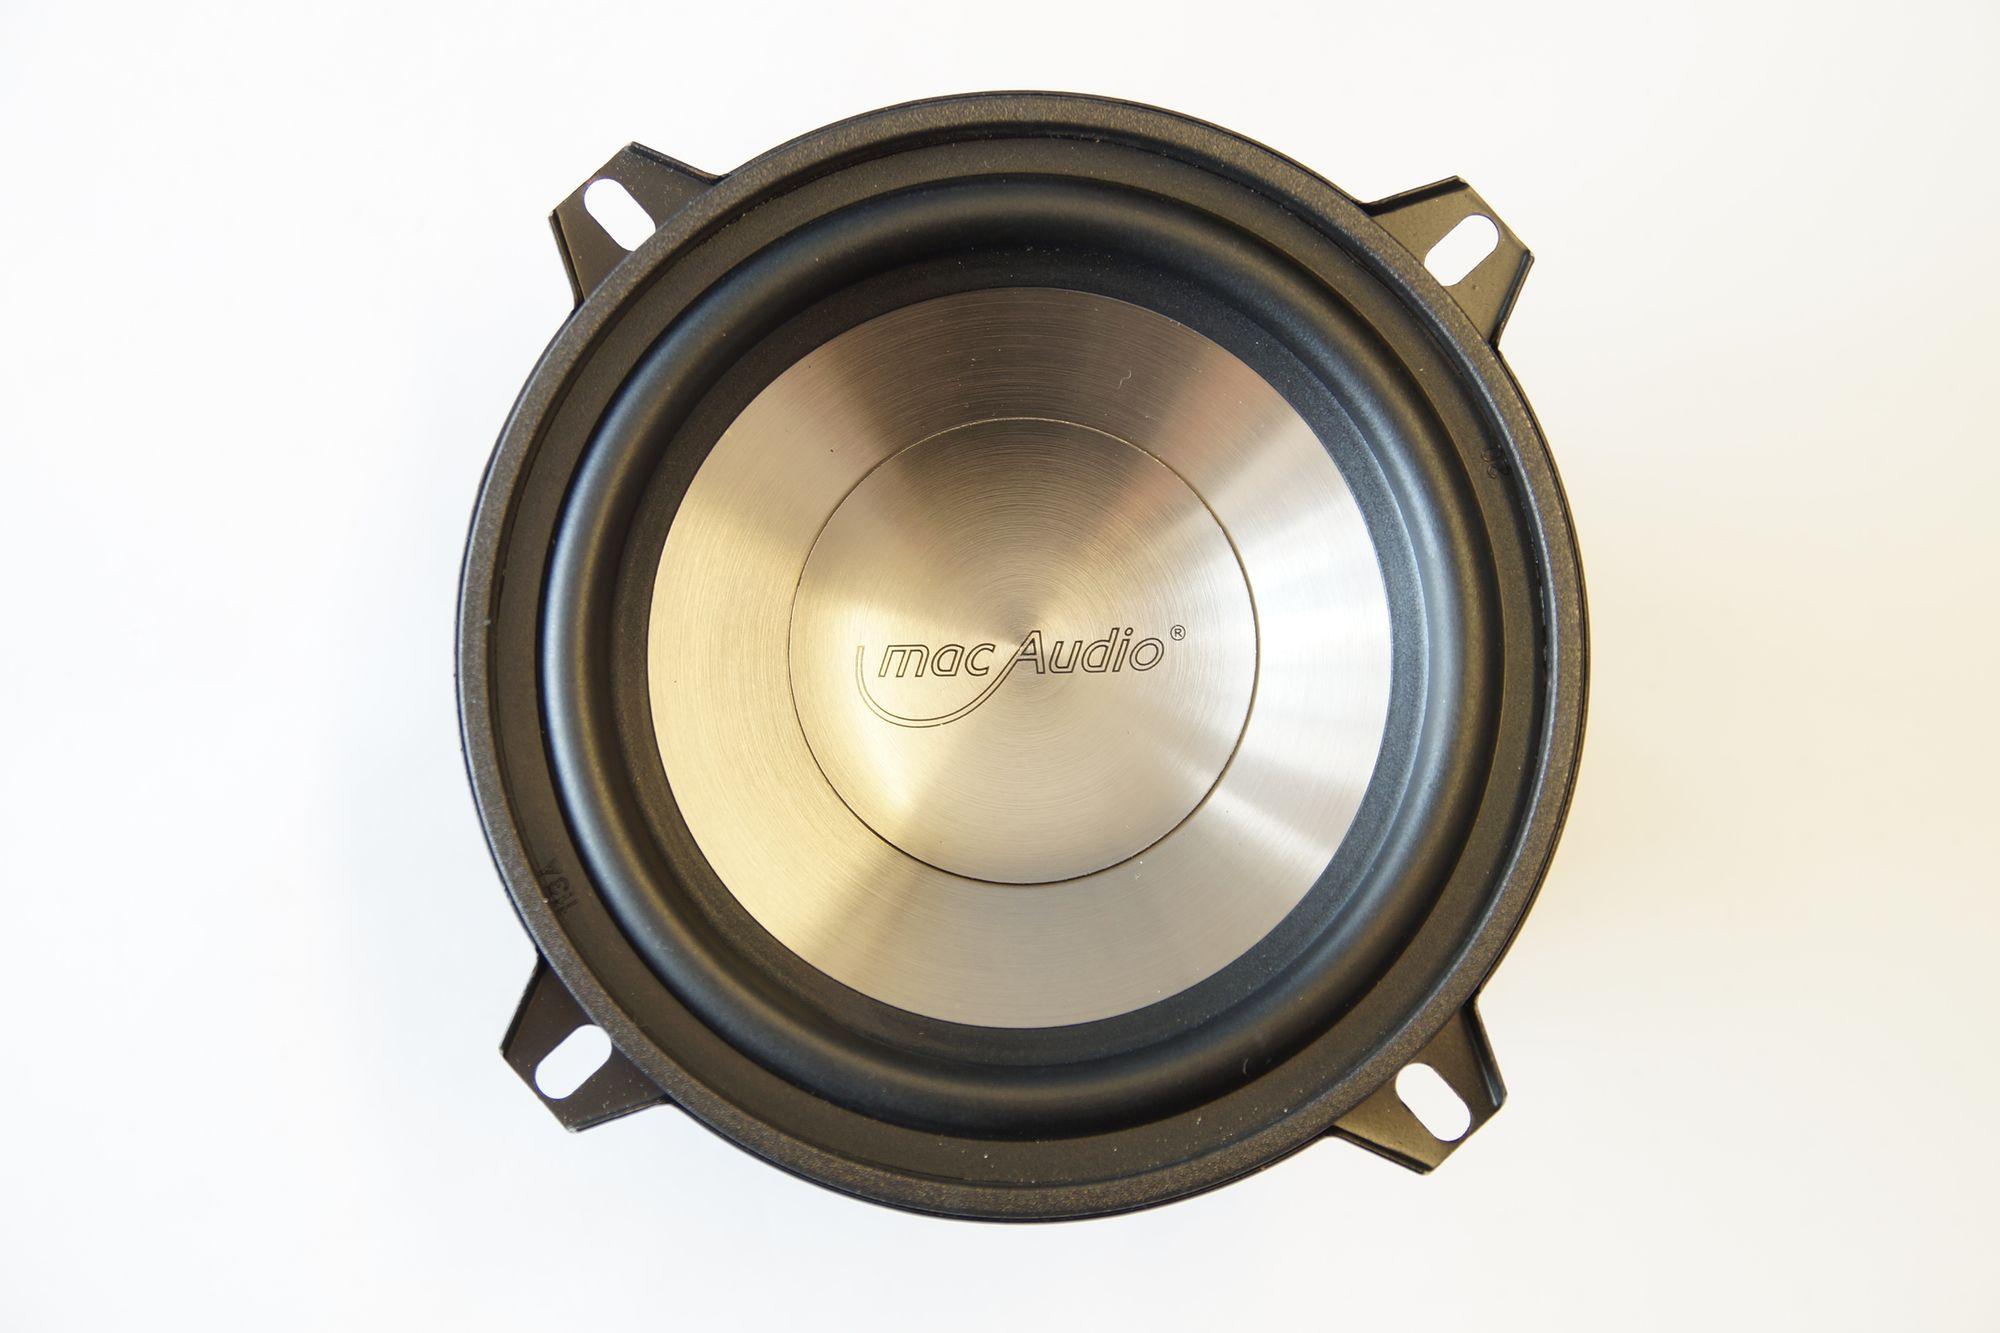 130 mm Kickbass Tiefton Lautsprecher Subwoofer 13 cm mac Audio Audio DVD 2.13 001